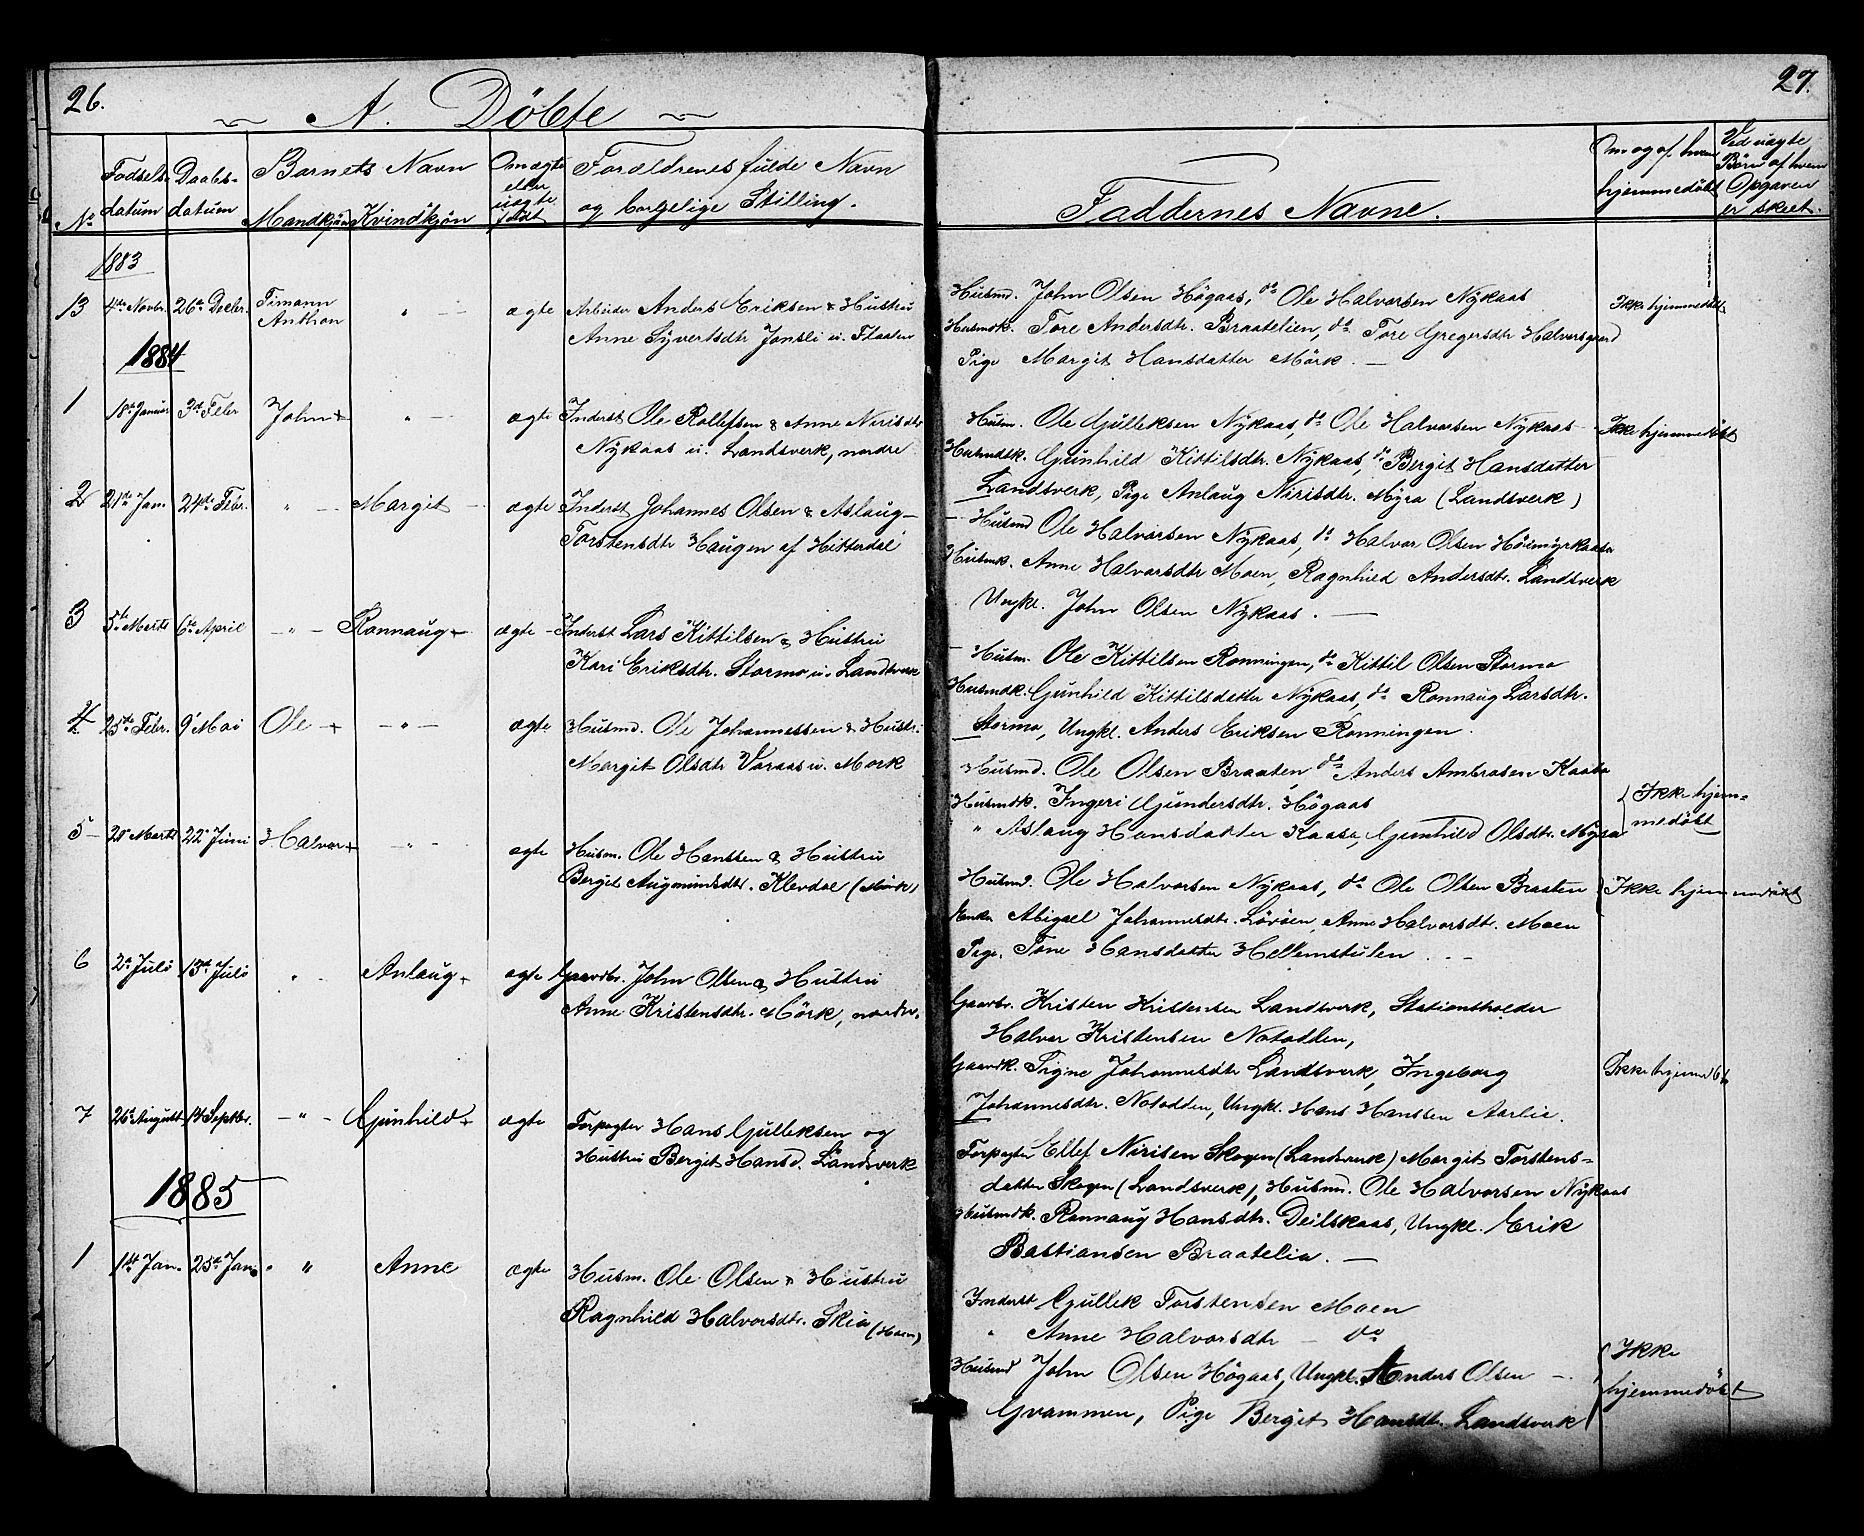 SAKO, Heddal kirkebøker, G/Gb/L0001: Klokkerbok nr. II 1, 1866-1887, s. 26-27